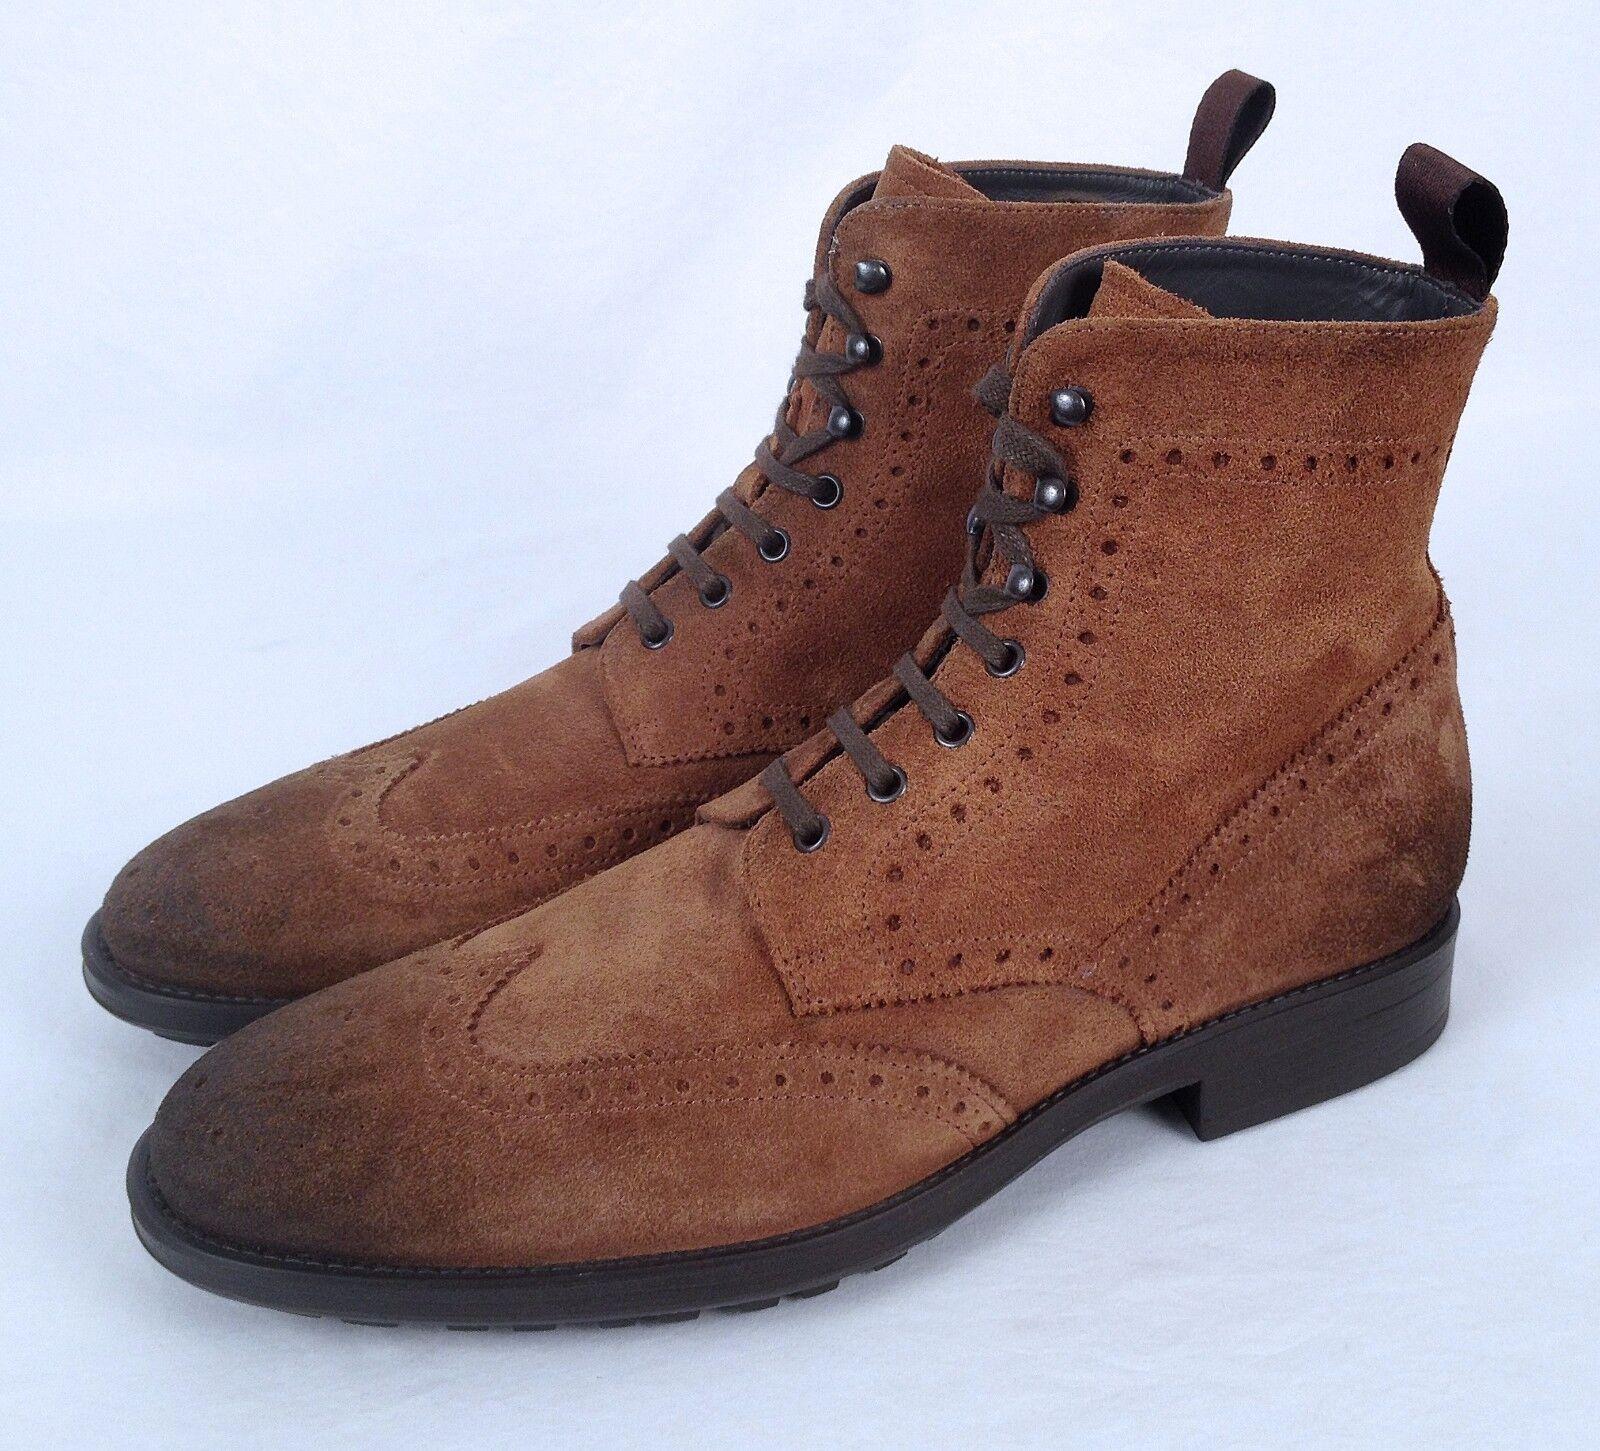 To Boot New York 'Brennan' Wingtip Boot- Light Brown- Size 15 M-   (B31)